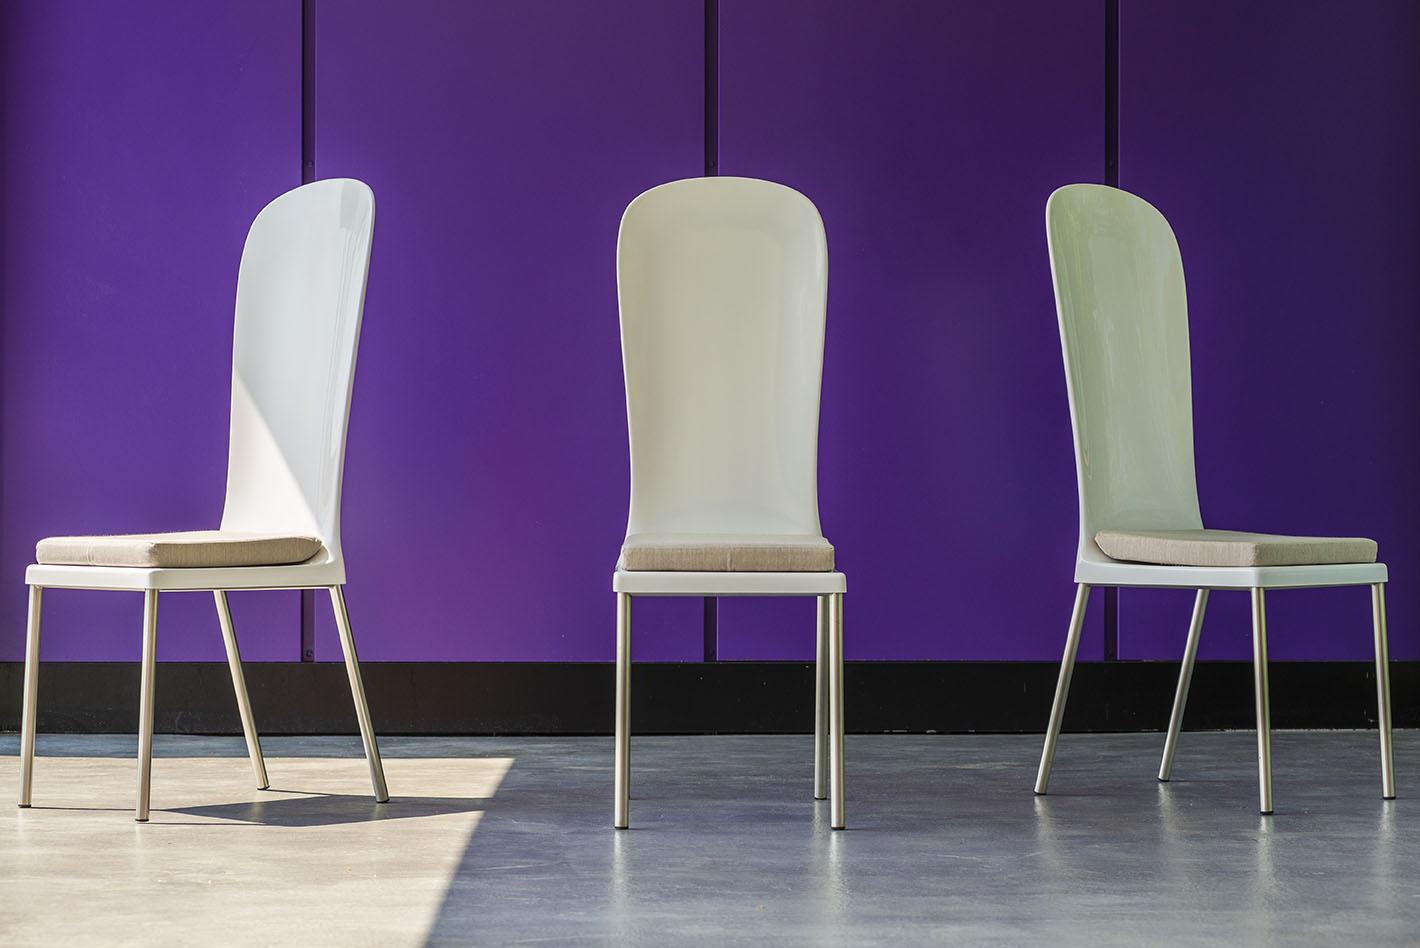 chaise jardin design composites inox Dali Passion Art'Mely Fabrice Koukoui